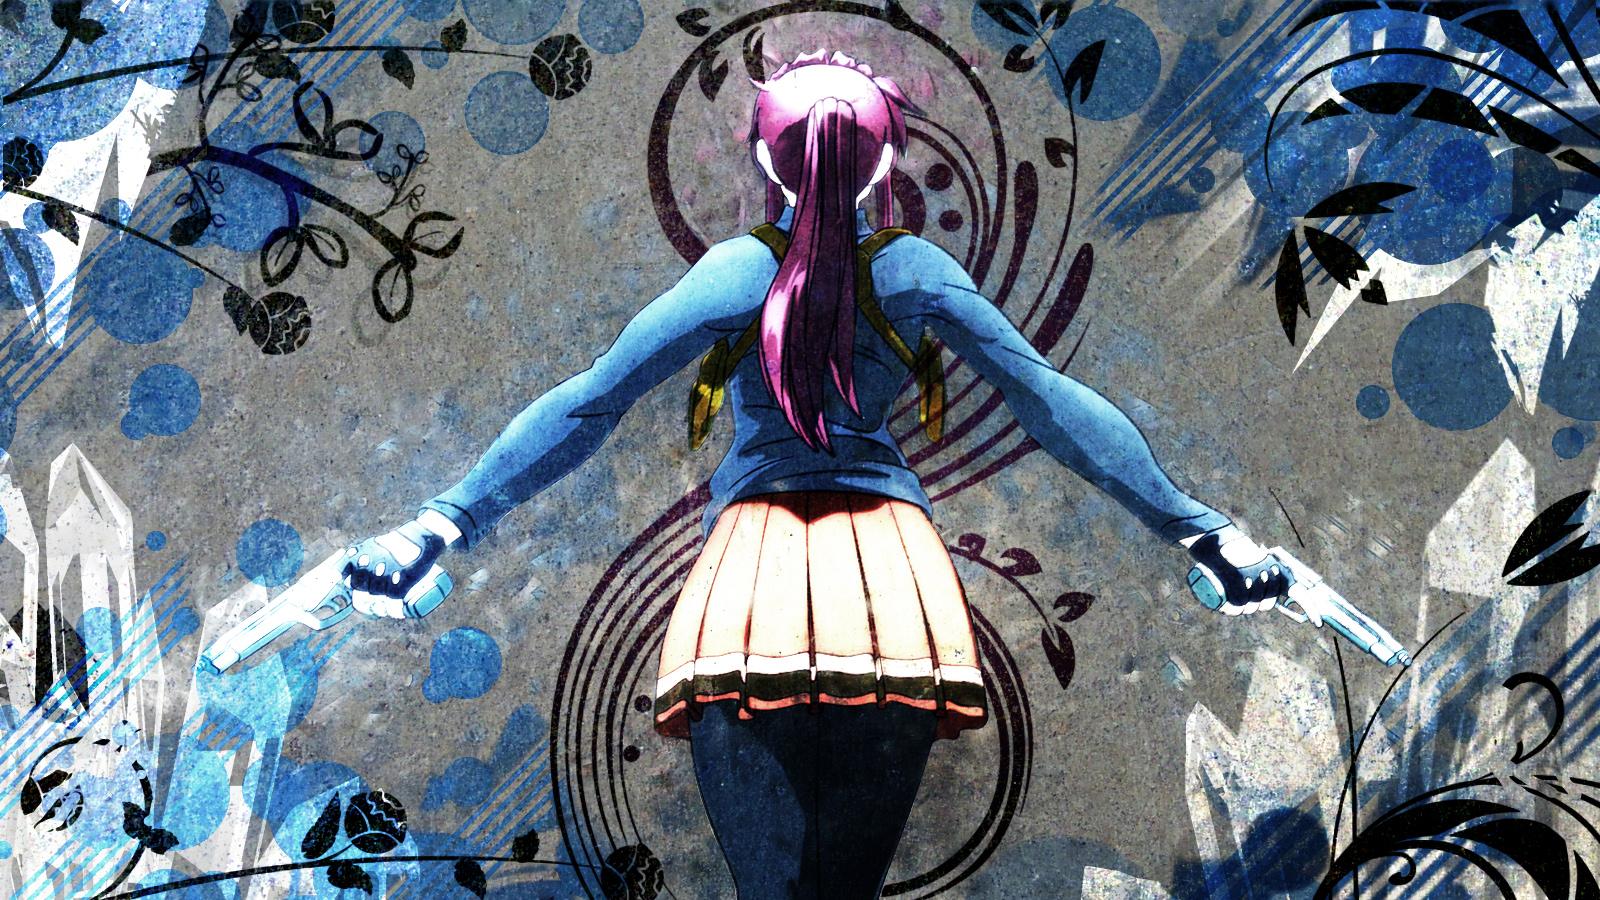 Black Lagoon HD Wallpaper 1600x900 | Your daily Anime ...